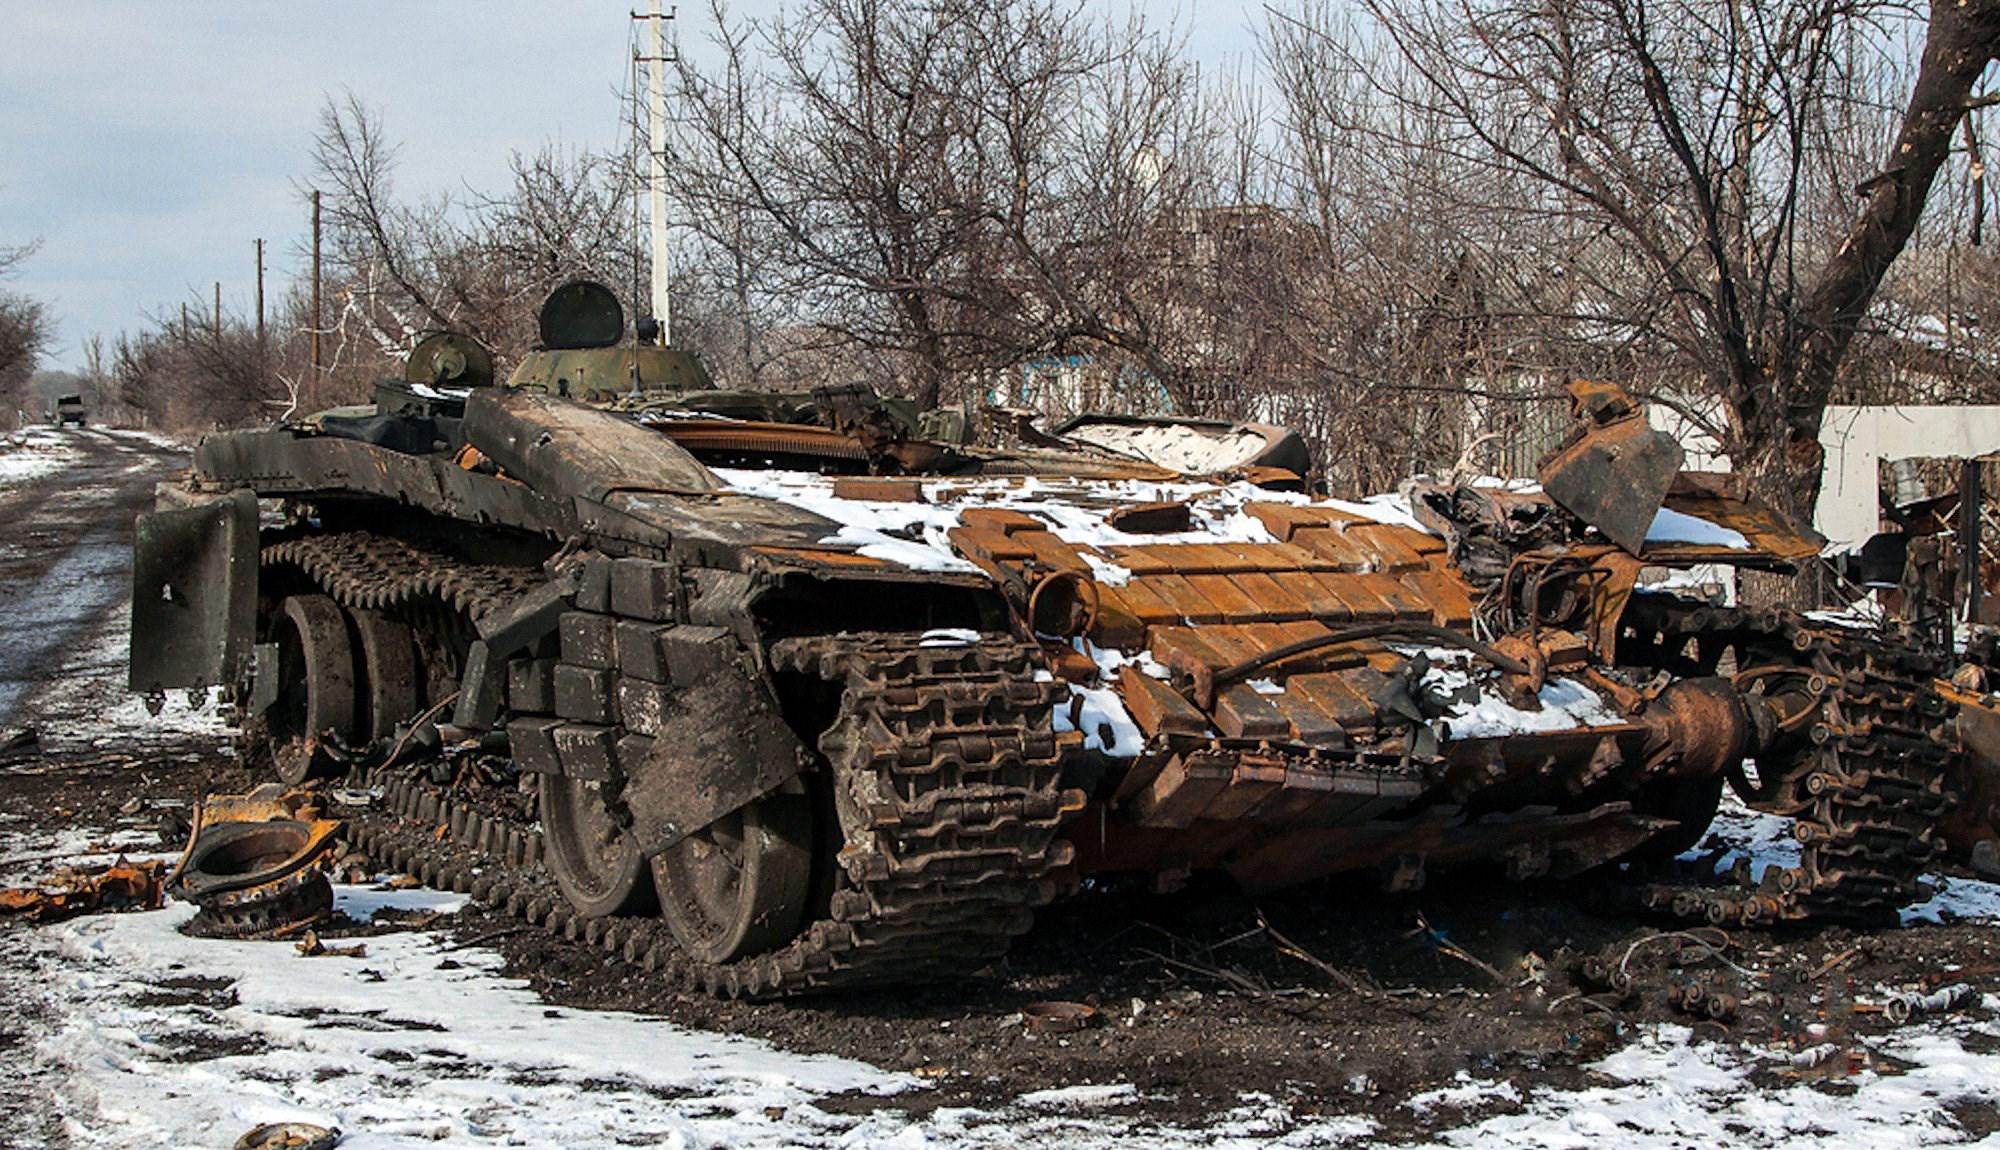 00 LNR 2015 03 wrecked ukie tank